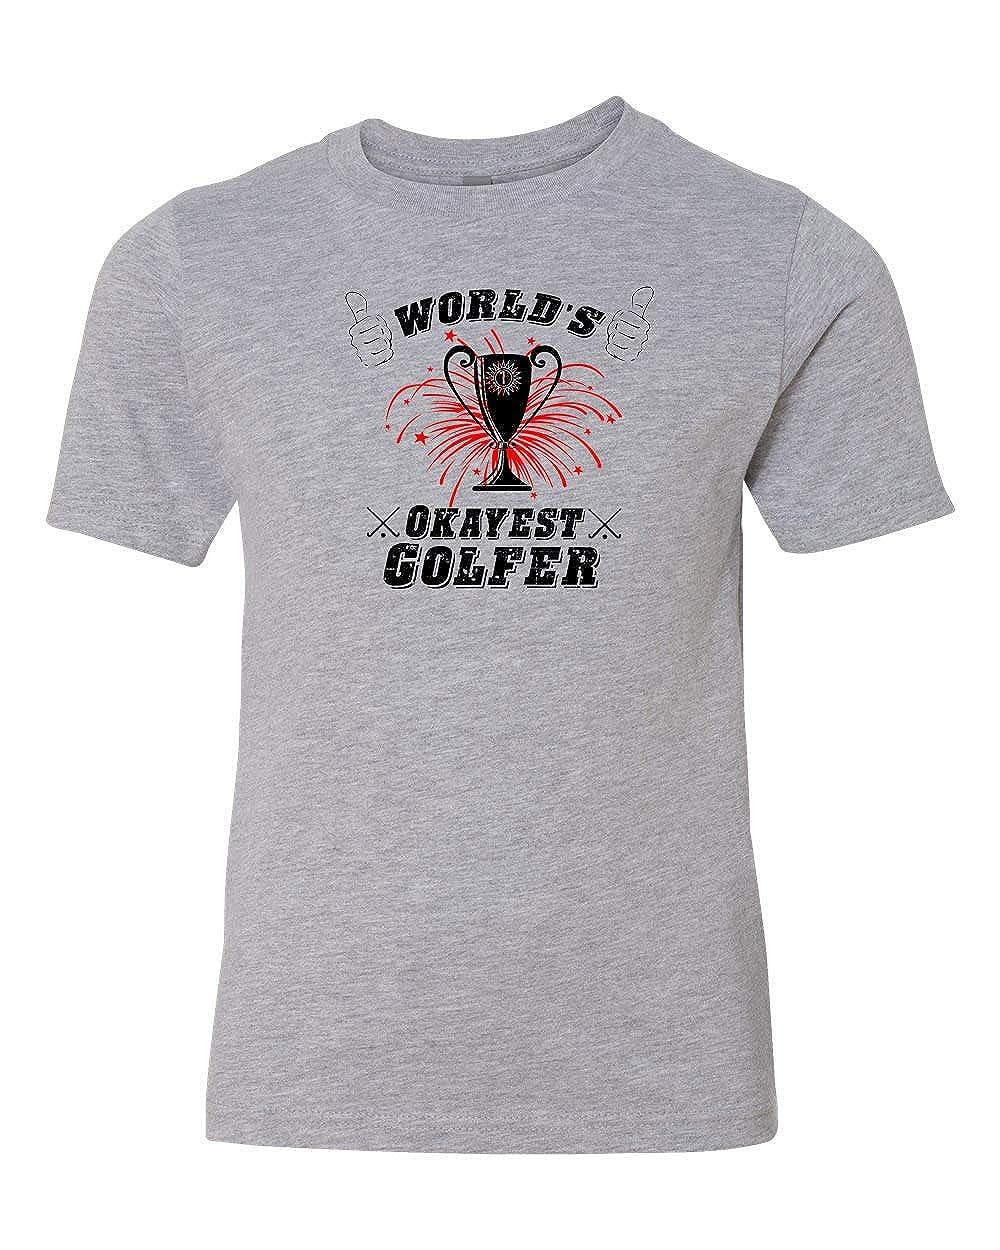 Custom Apparel R Us Worlds Okayest Golfer Girls Boys Short Sleeve